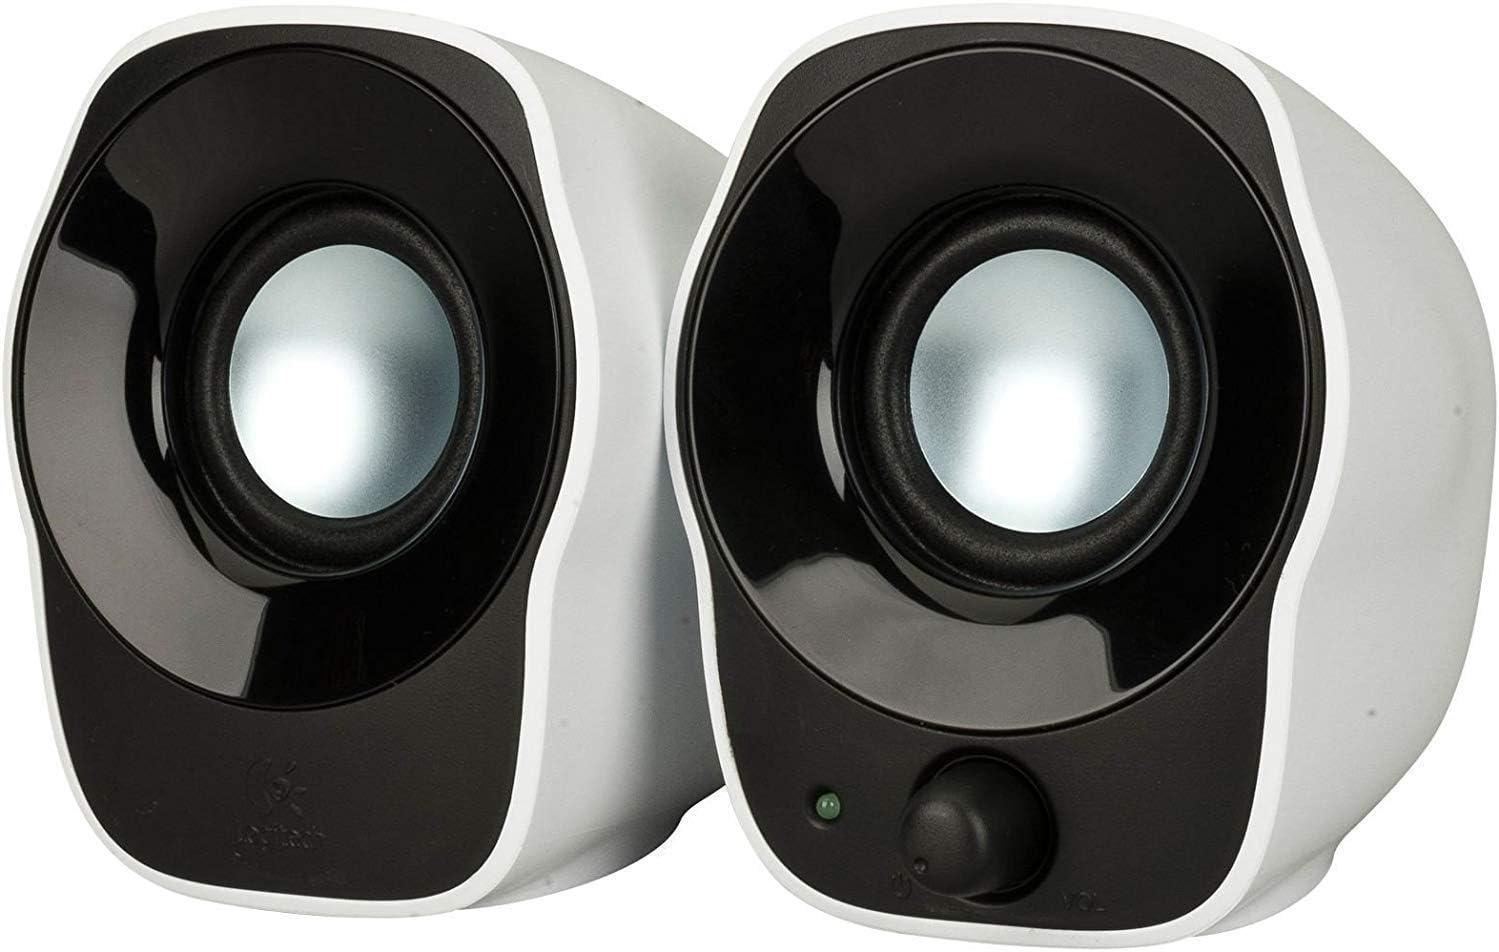 Logitech Z120 Sistema de Altavoces Compacto para PC, Entrada Audio 3.5 mm, USB, Controles Integrados, Distribución de Cable, Enchufe EU, Ordenador/Smartphone/Tablet, Blanco/Negro